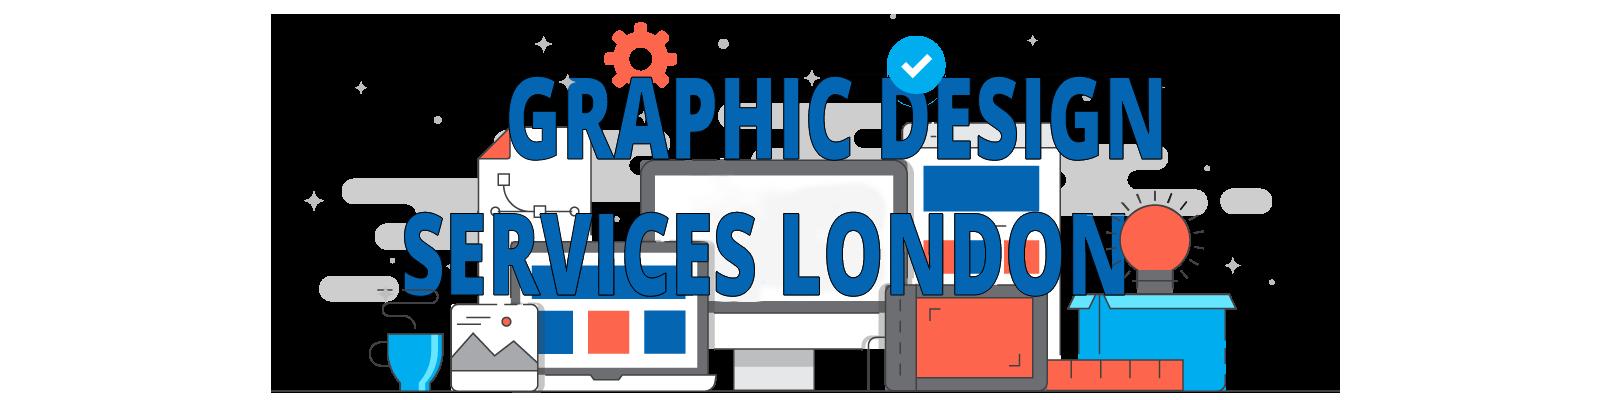 Graphic Design Services London